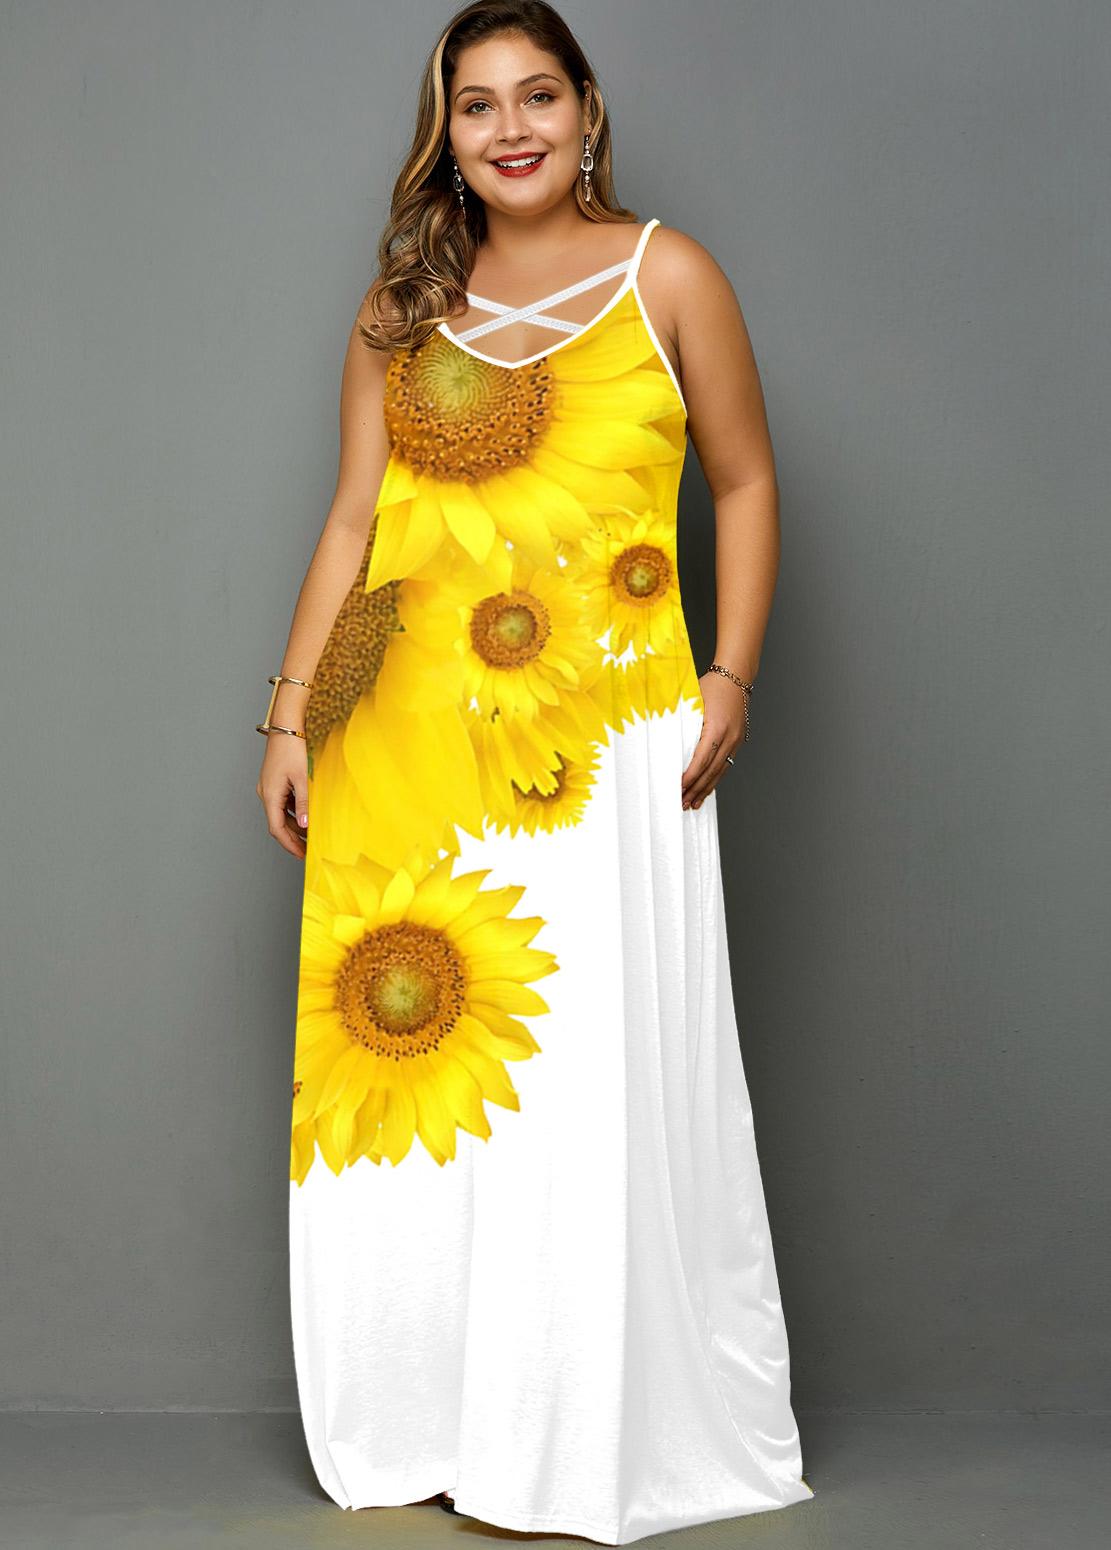 ROTITA Plus Size Spaghetti Strap Sunflower Print Pocket Dress